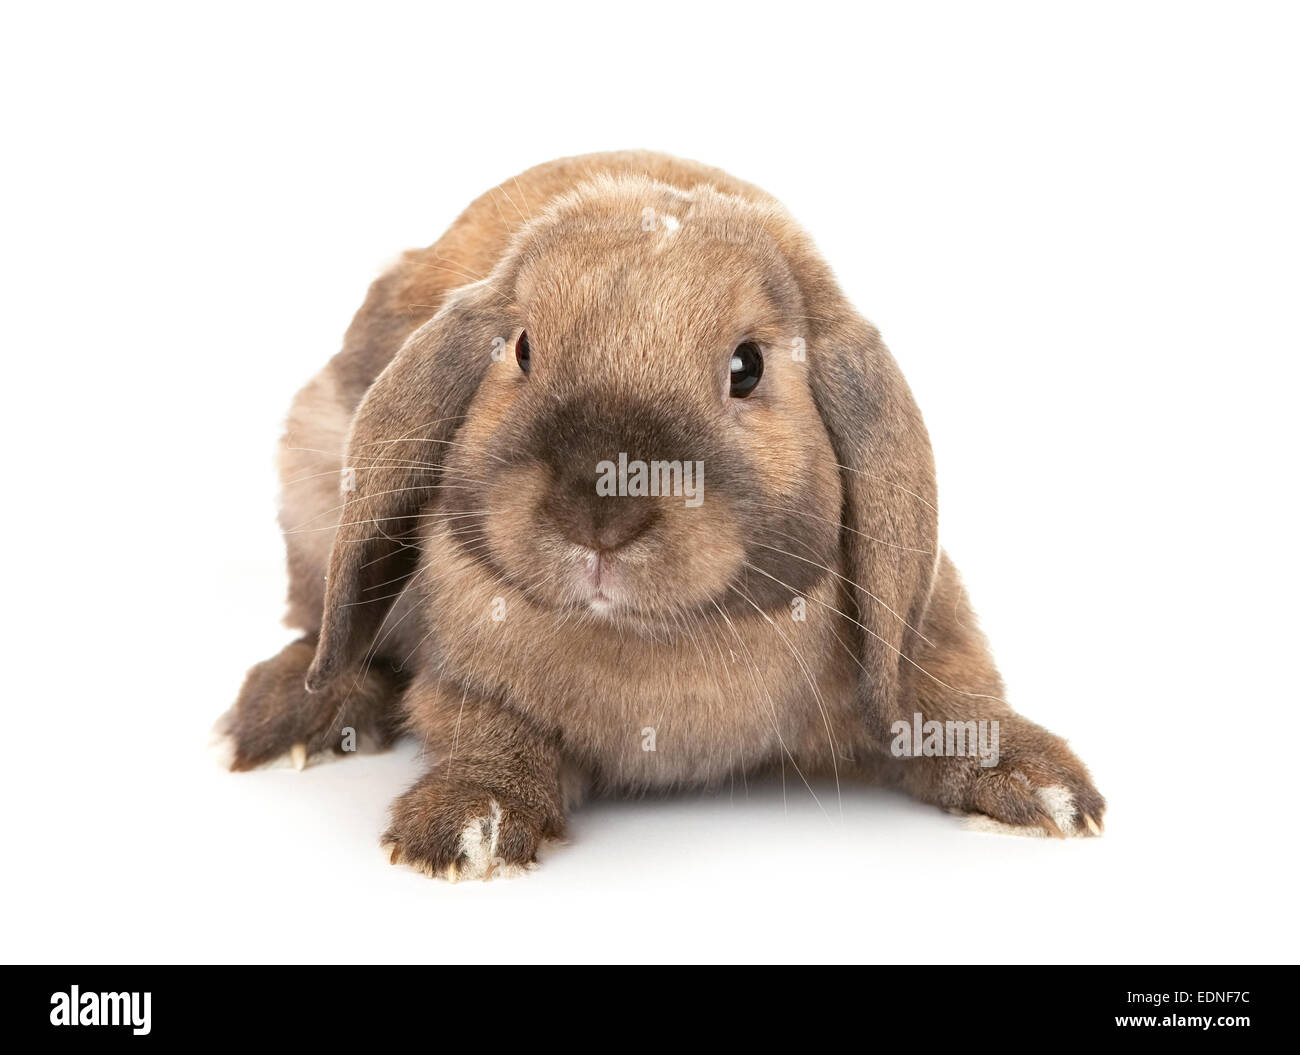 Rabbits are rams. Dwarf Rabbit Ram: breed description 36